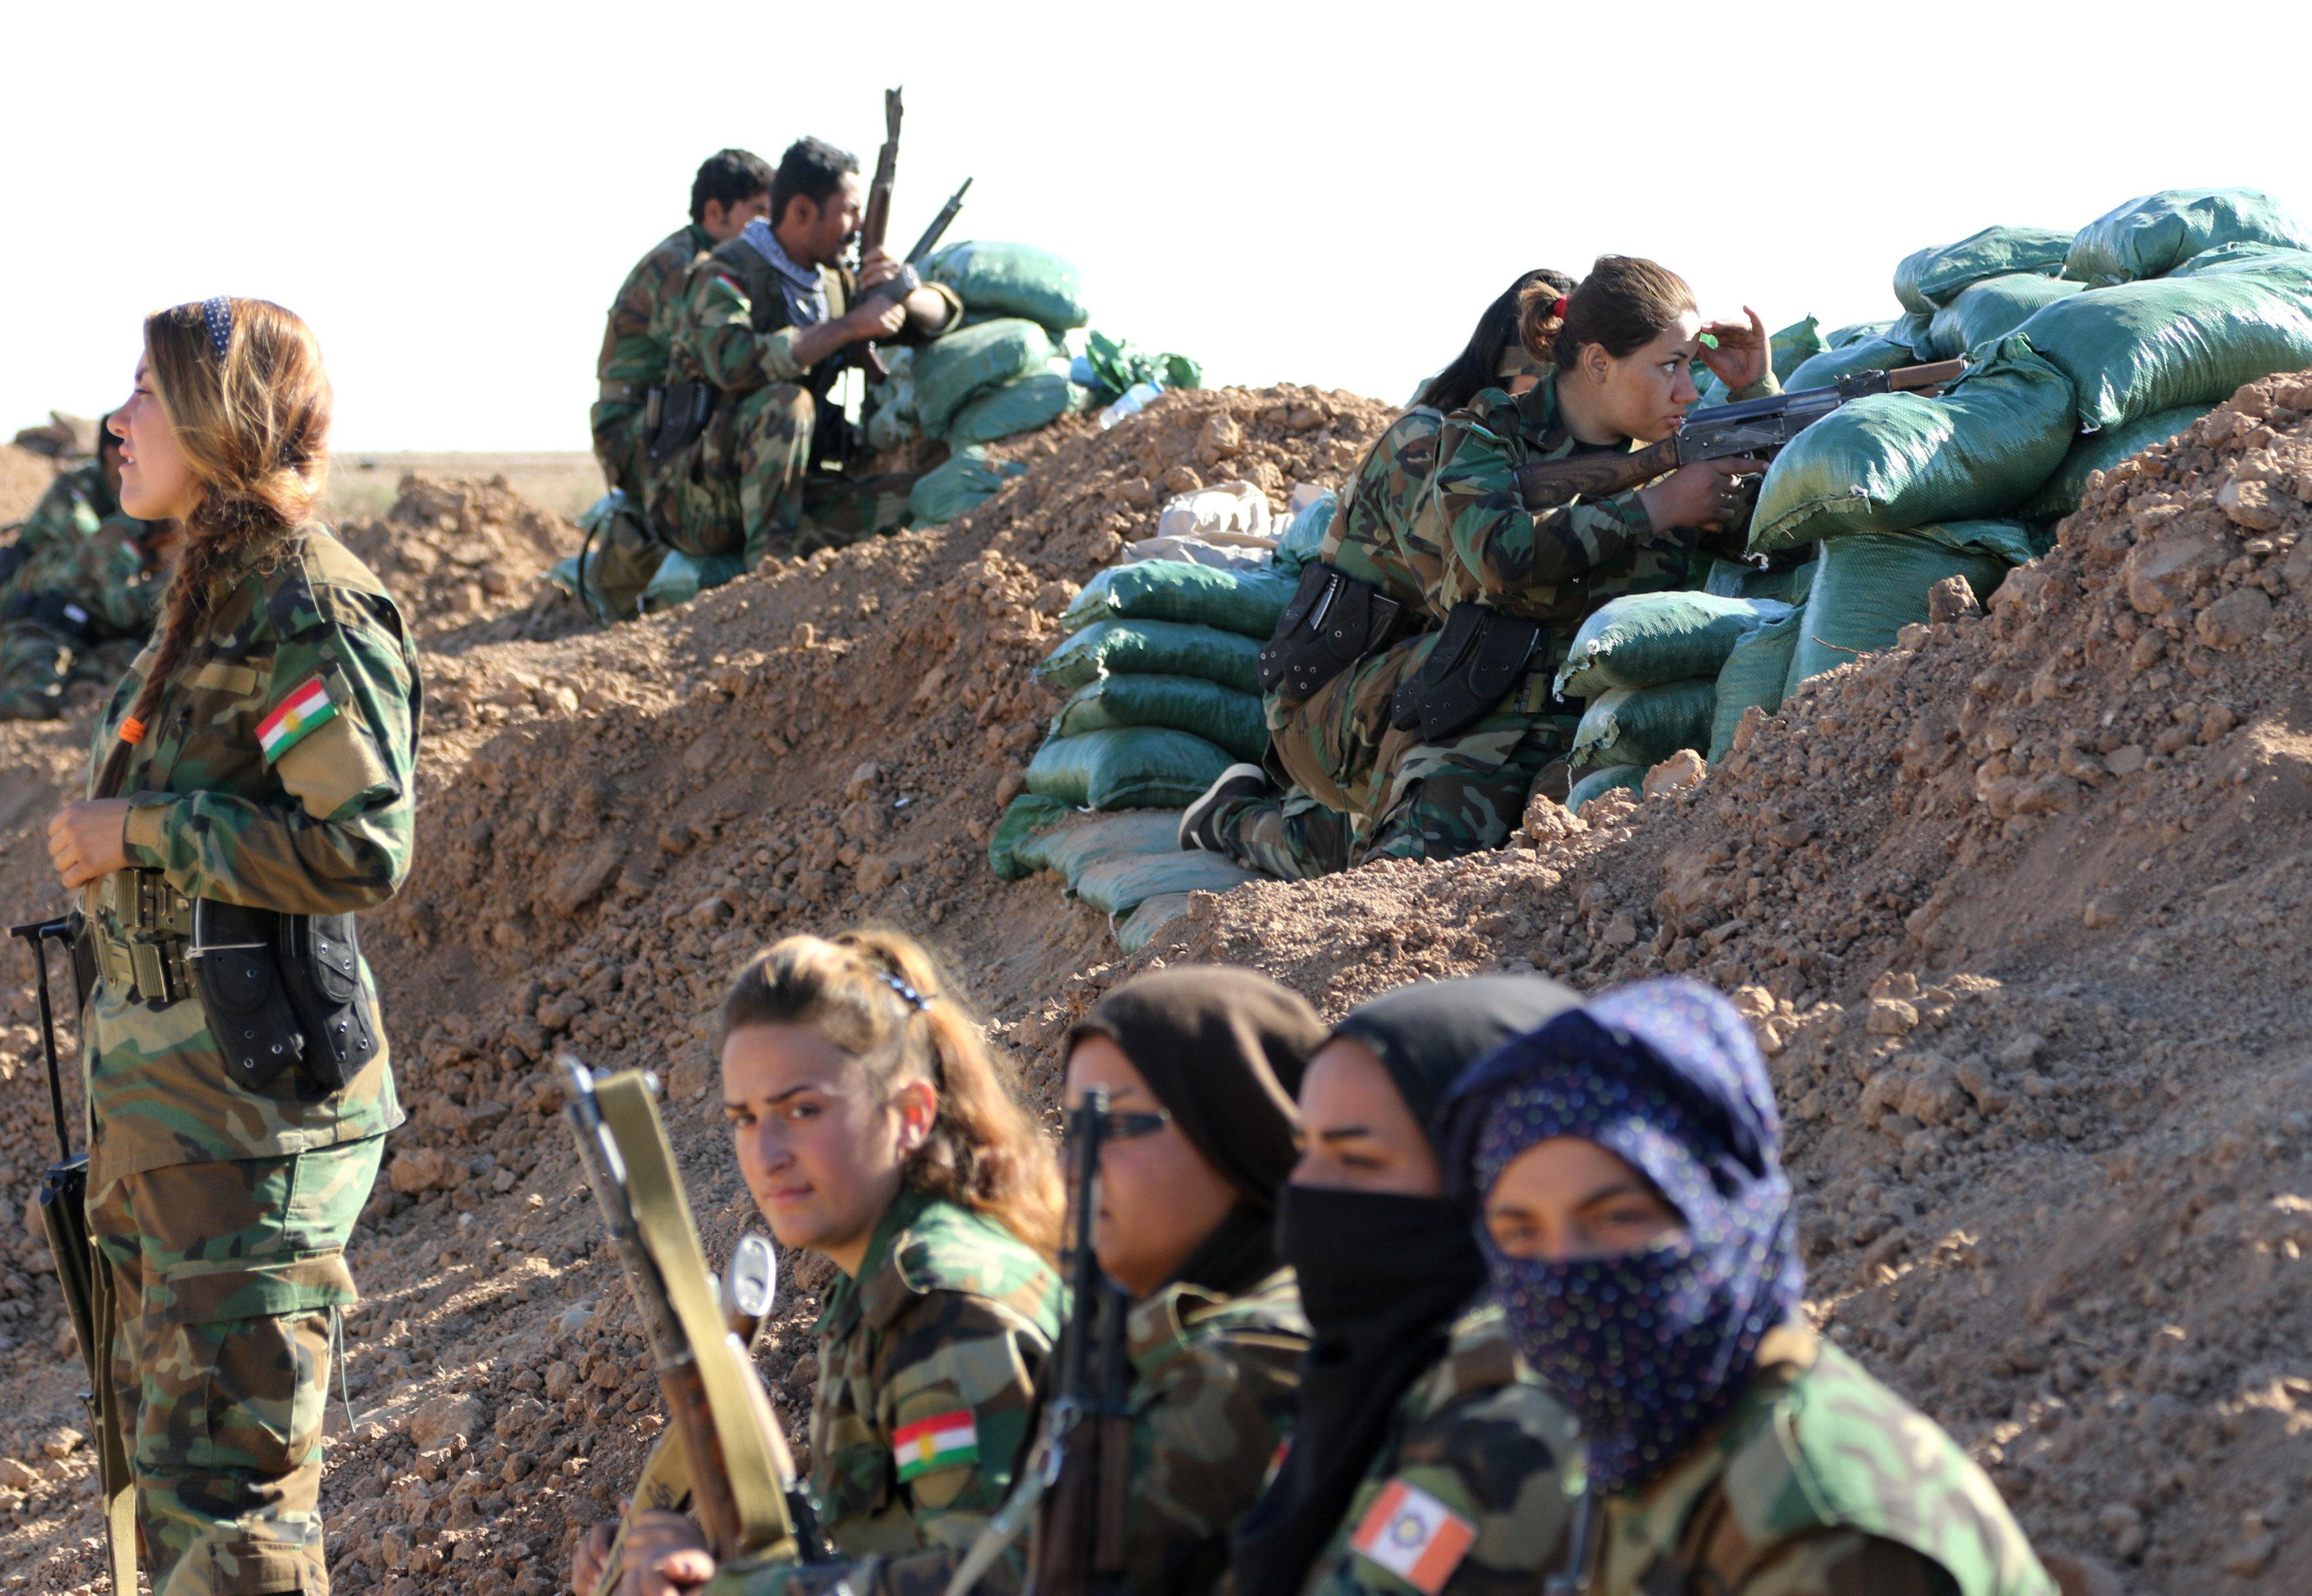 Iranian-Kurdish female fighters sit near a sand berm during a battle with Islamic State militants in Bashiqa, near Mosul, Iraq